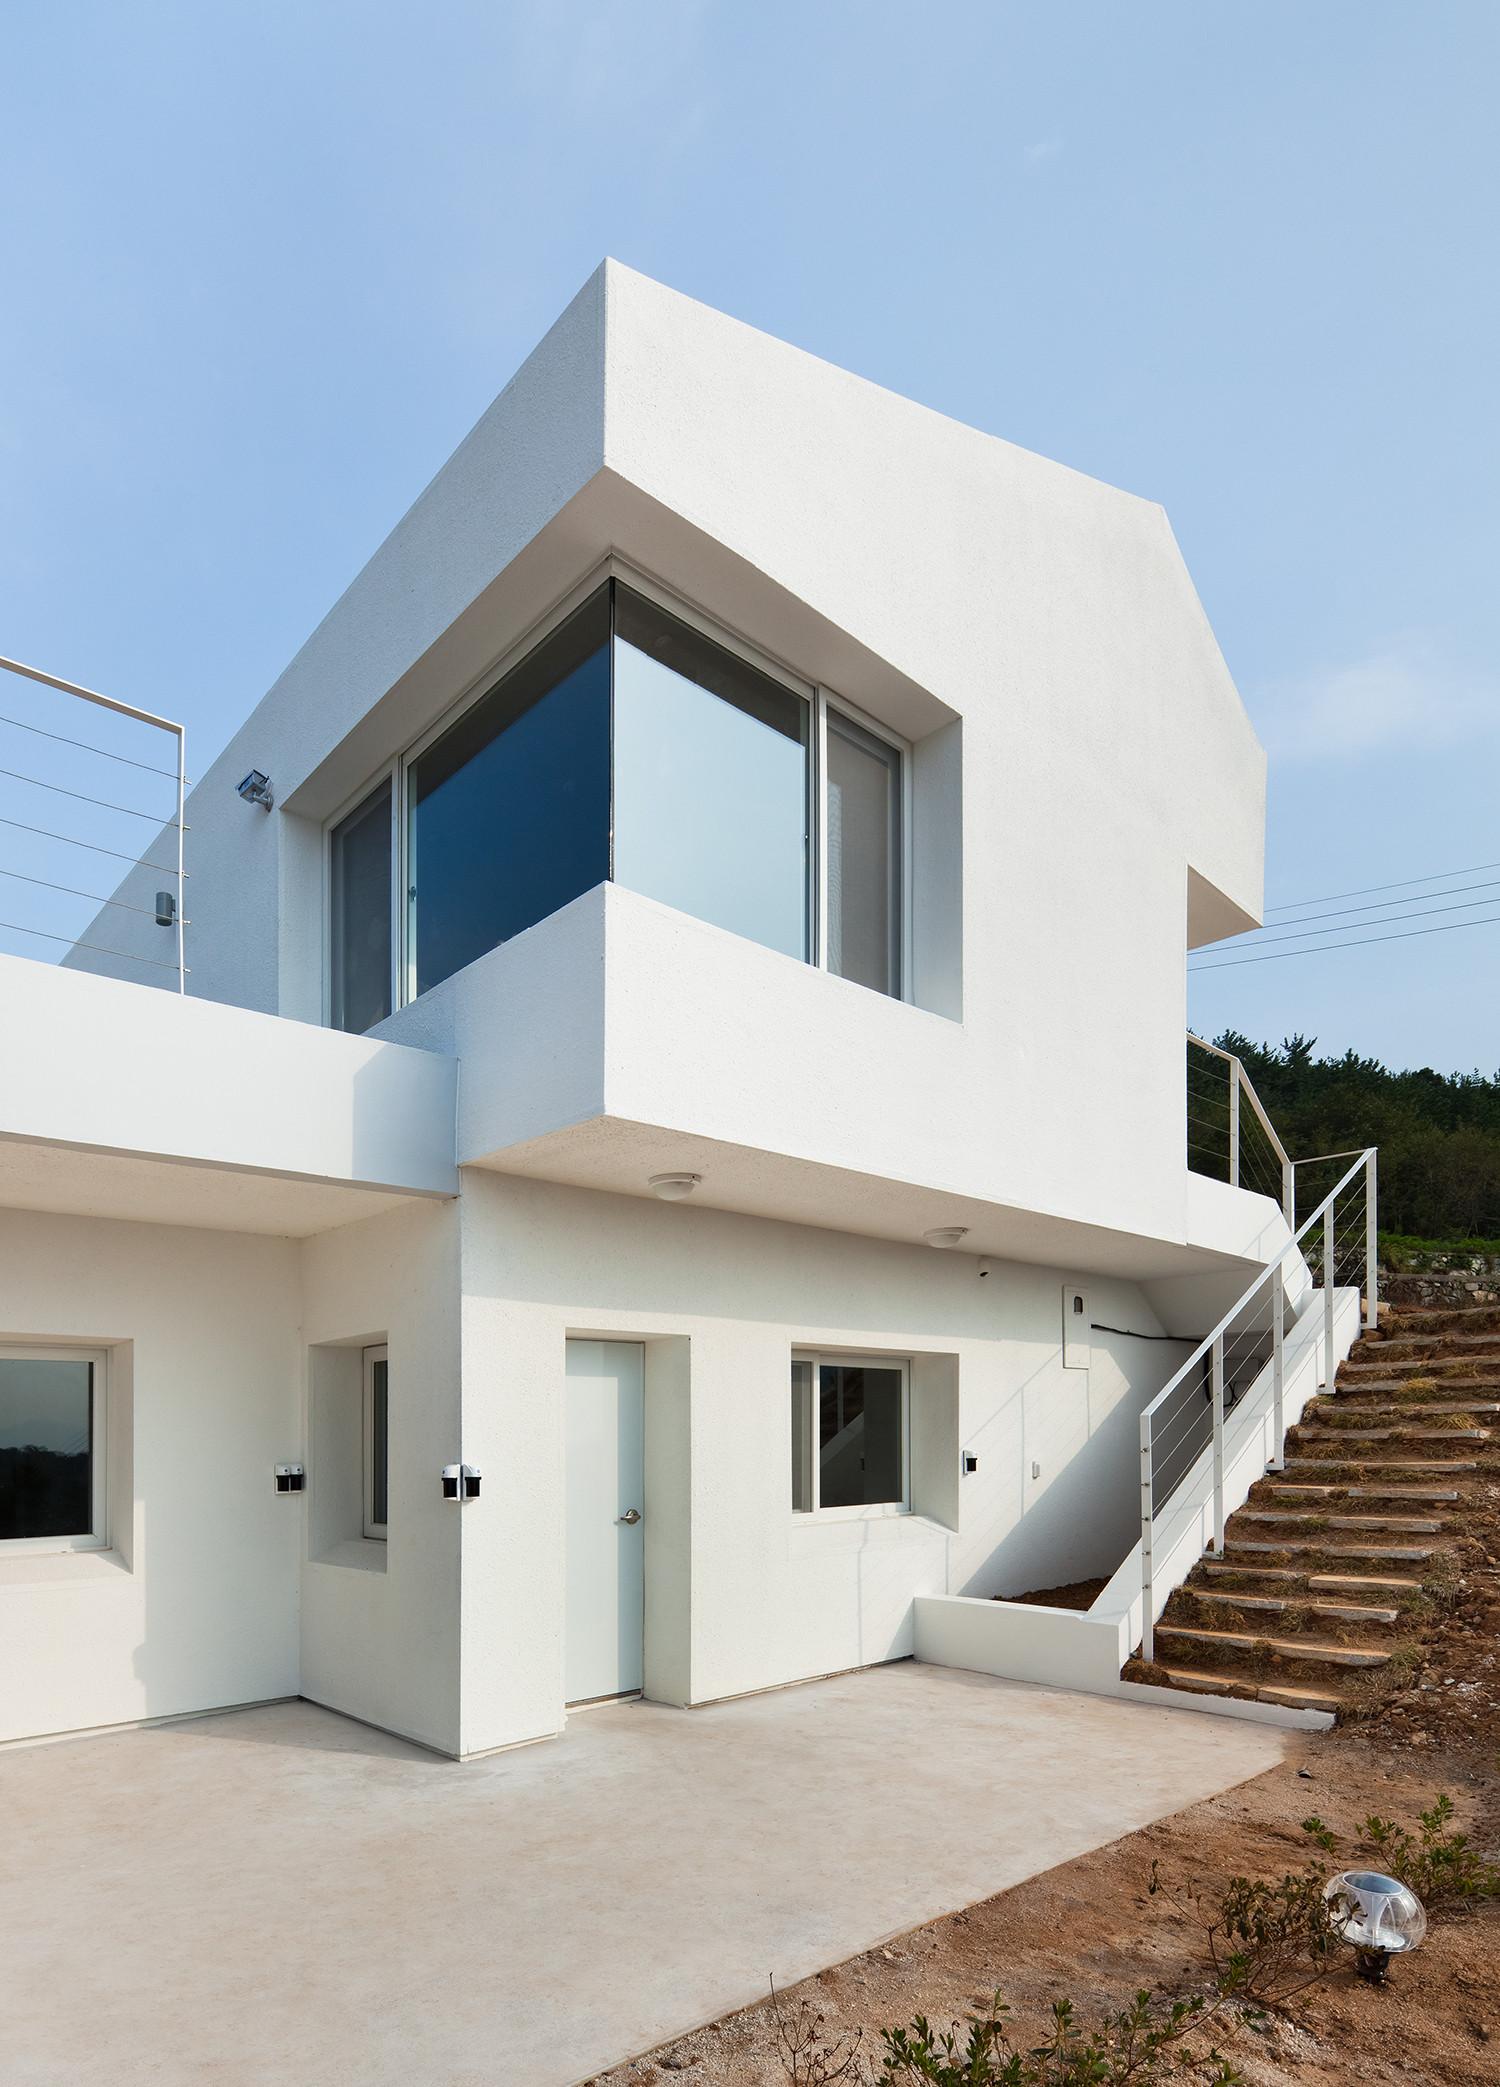 Gallery of net zero energy house lifethings 14 for Net zero house design